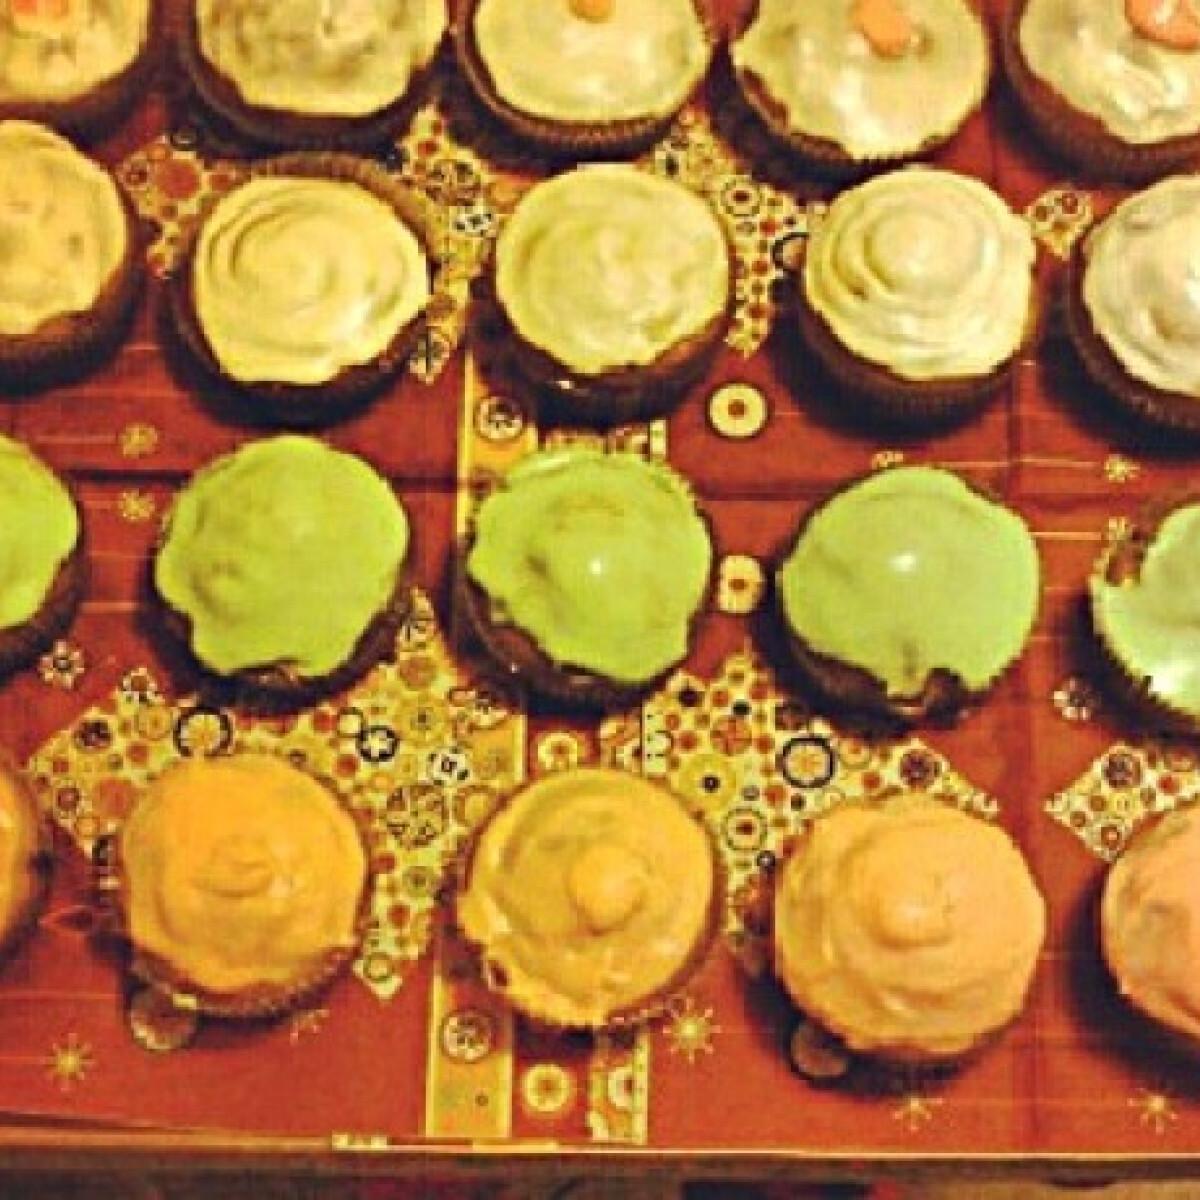 Ezen a képen: Cukormázas muffin